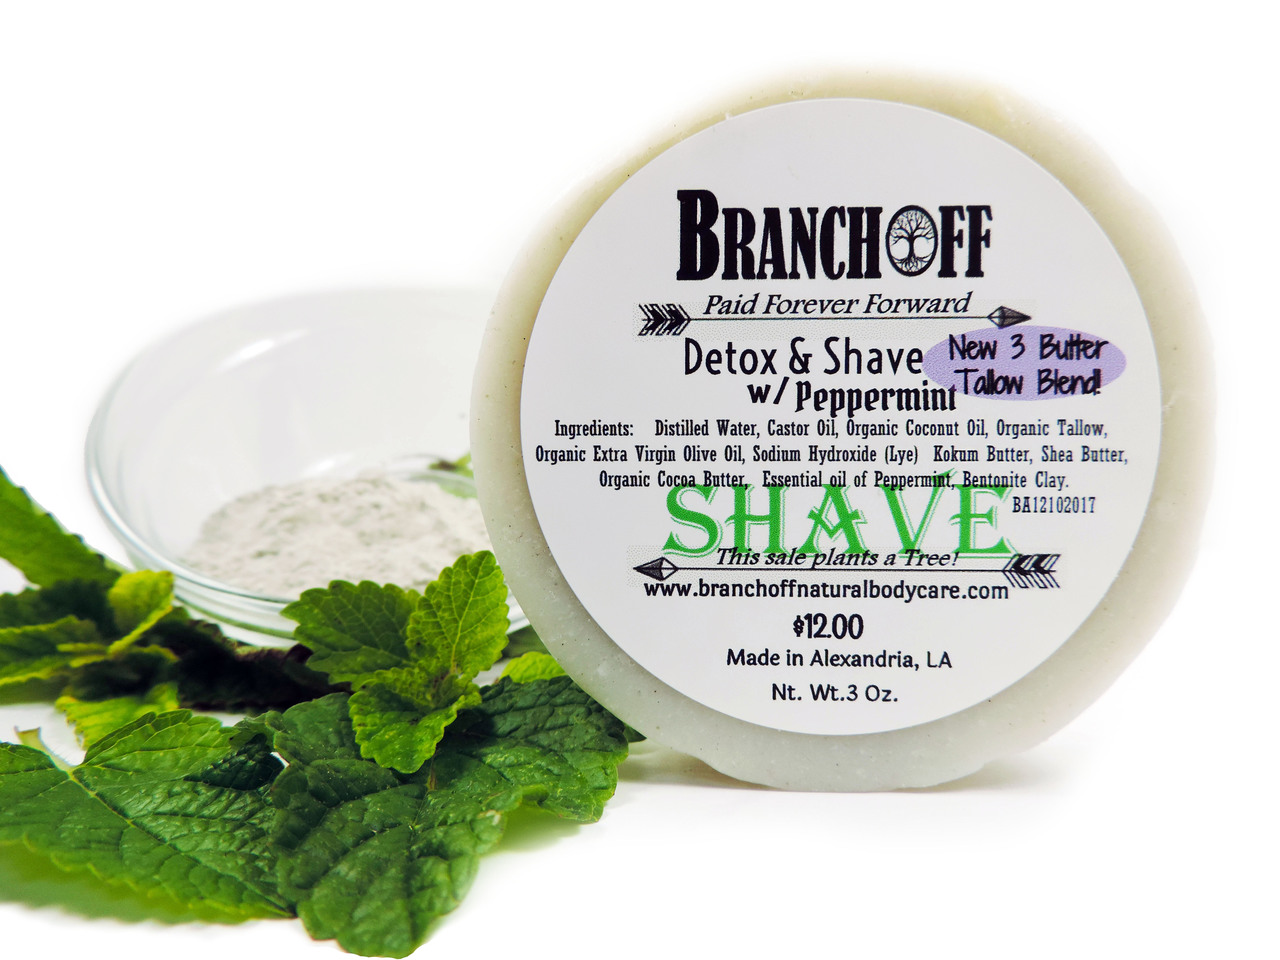 3 Butter Shave Bar